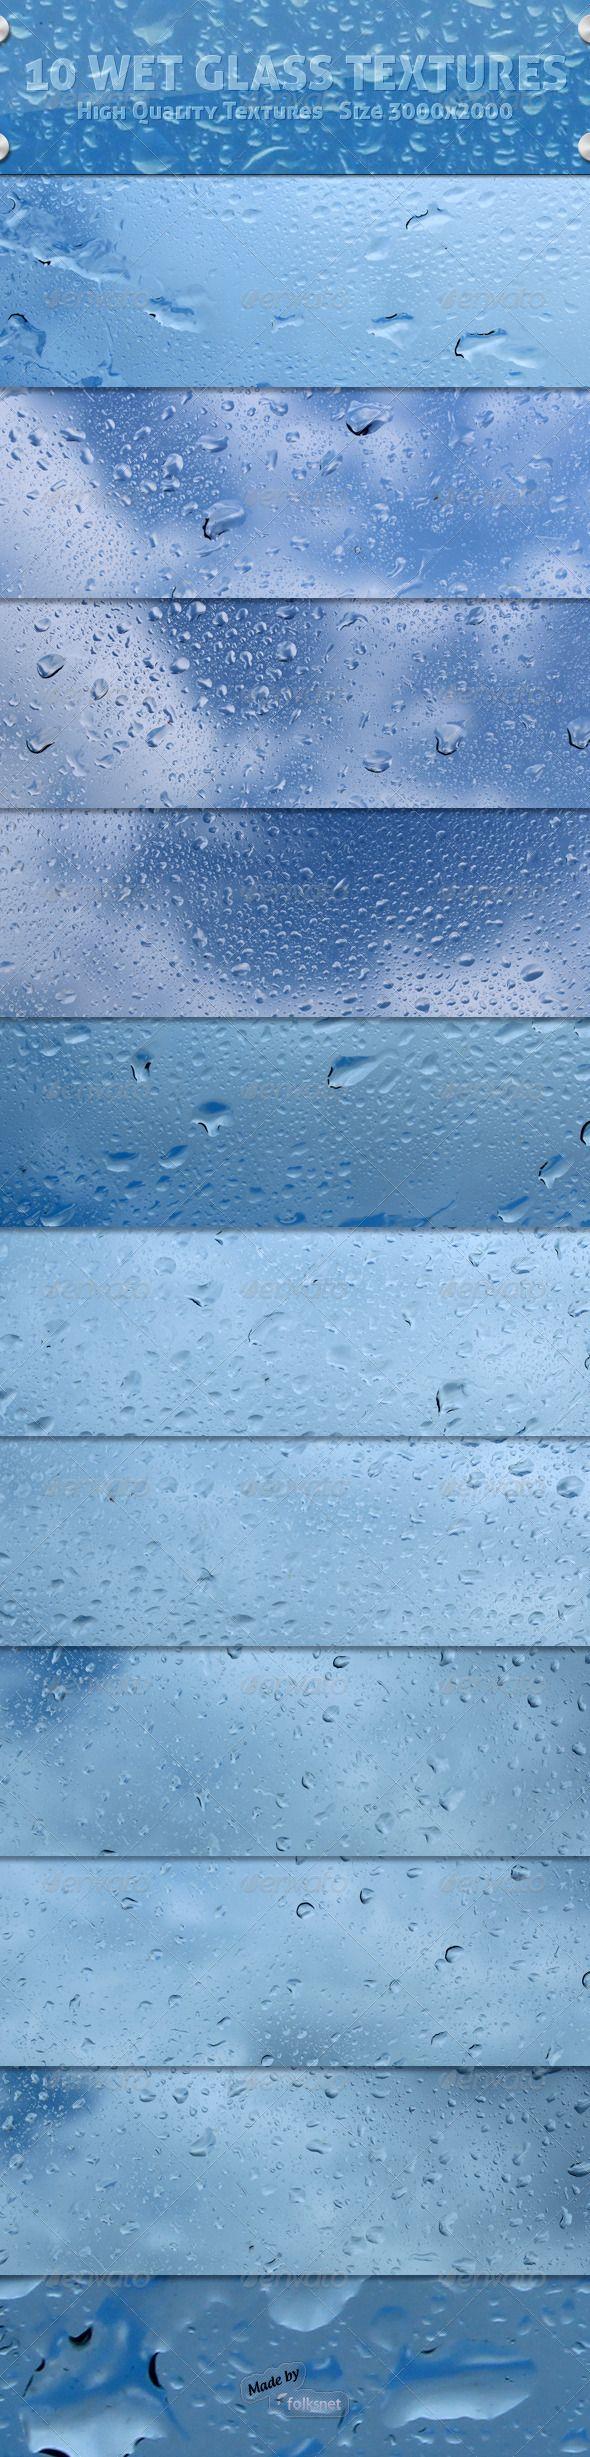 Wet Glass Textures Glass Texture Wood Texture Photoshop Photoshop Textures